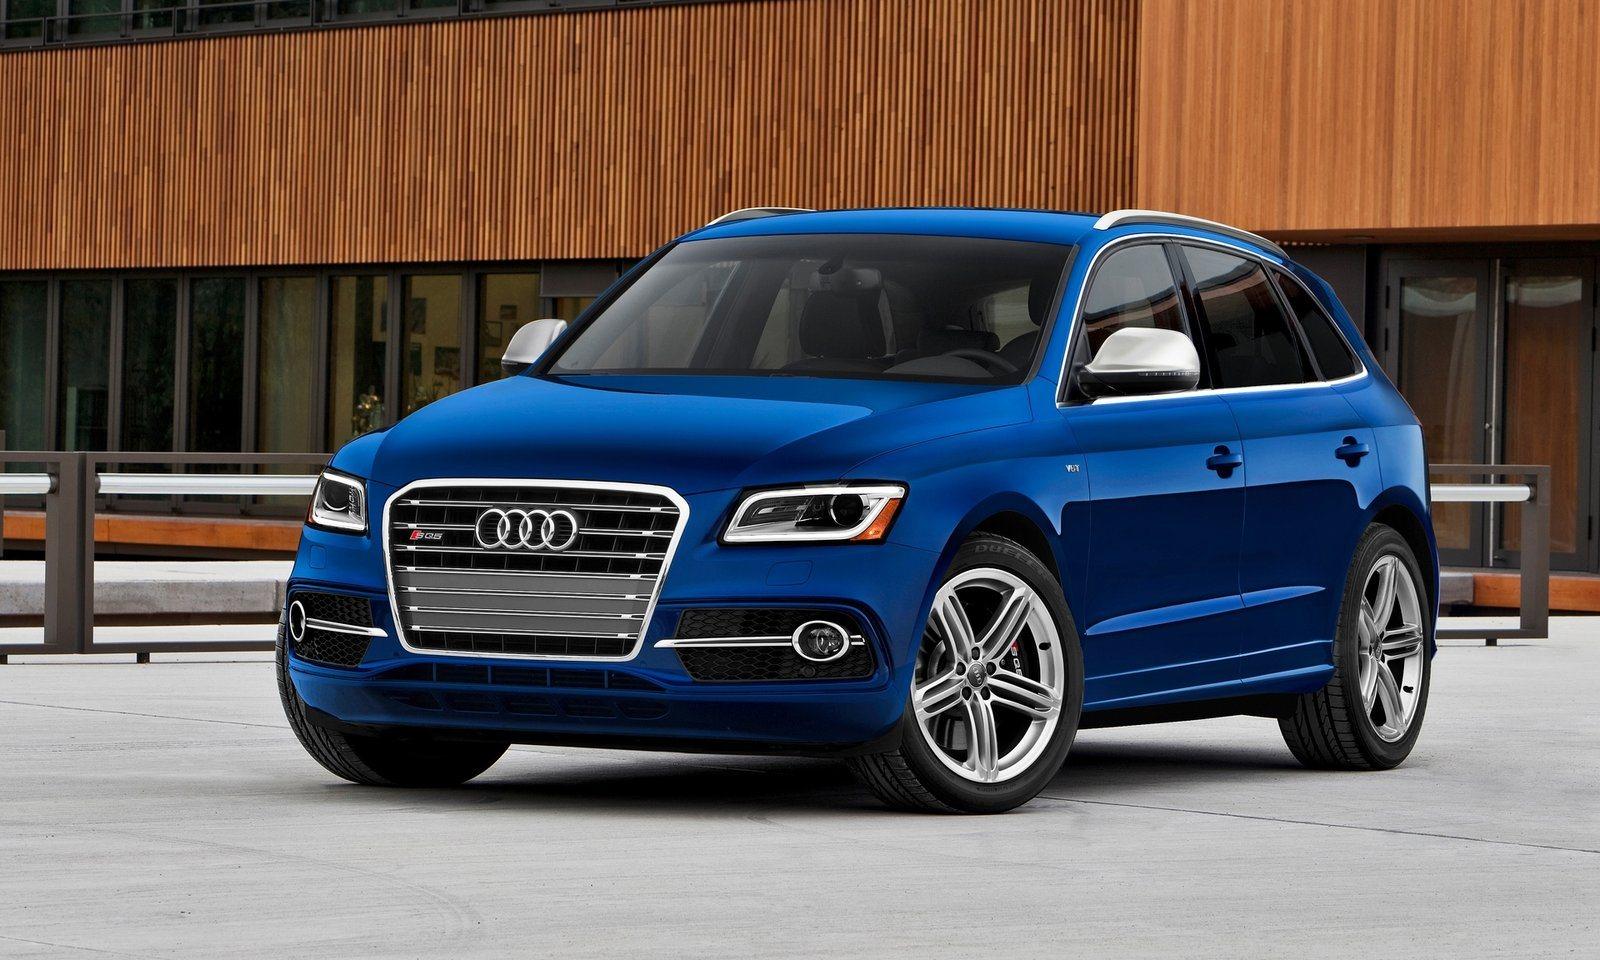 http://3.bp.blogspot.com/-KiO1R75o22Y/UOyj2ptOjDI/AAAAAAAAC9E/STQd5HDSicI/s1600/Audi-SQ5-3,0-TFSI-2014-wallpaper.jpg